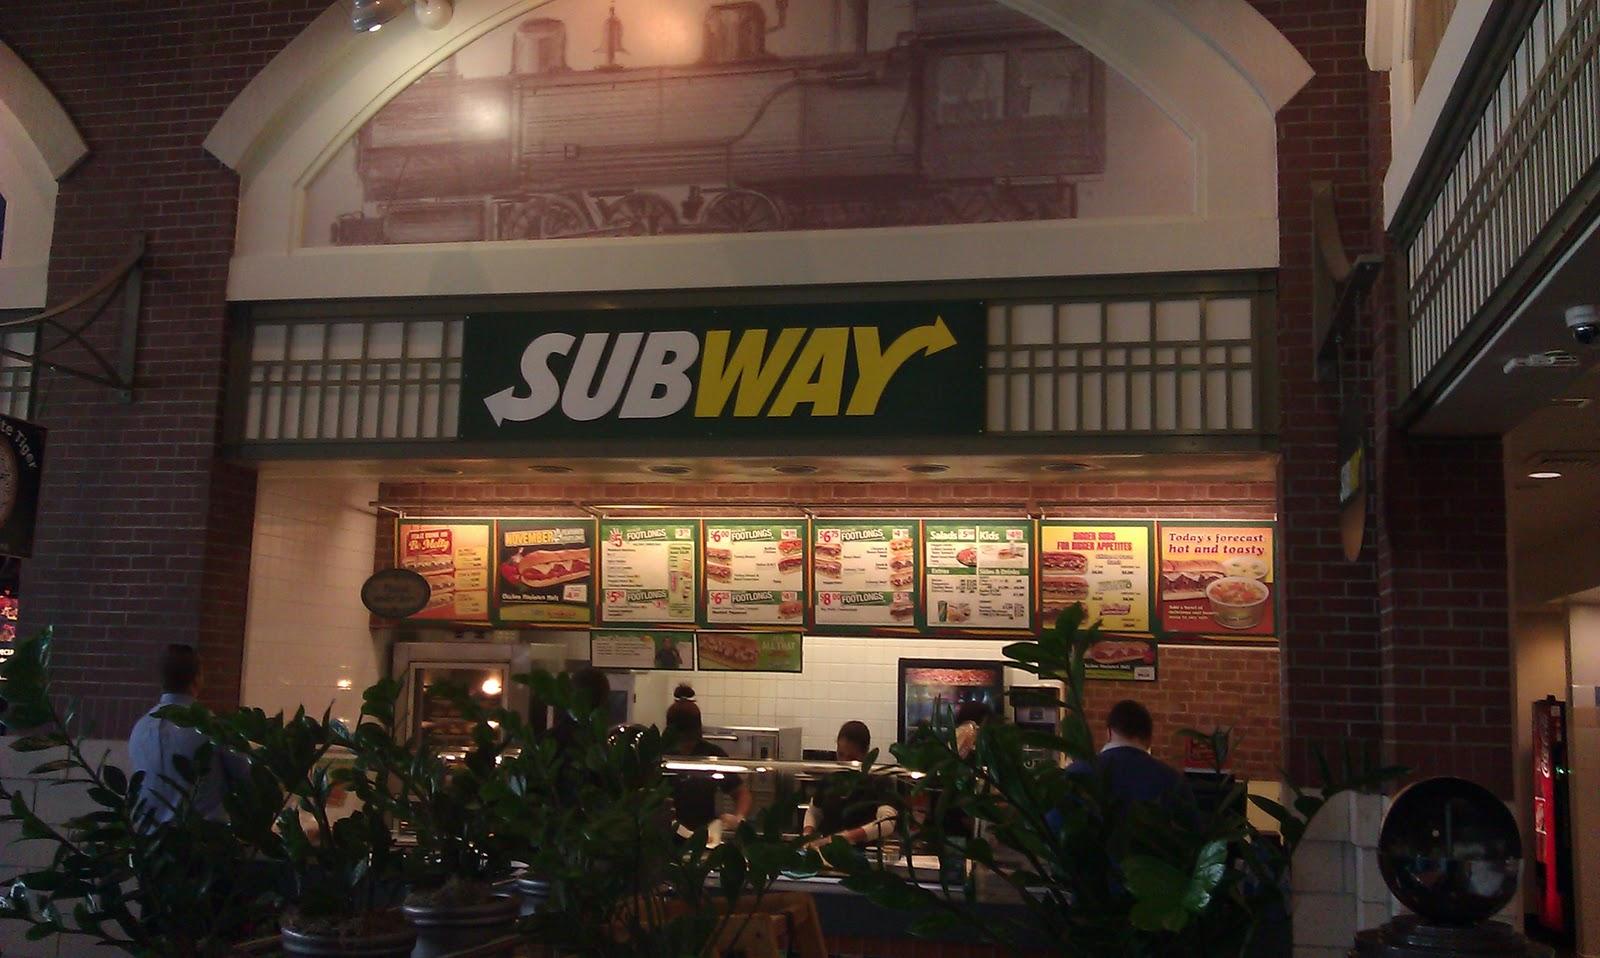 Subway Bowie Town Center